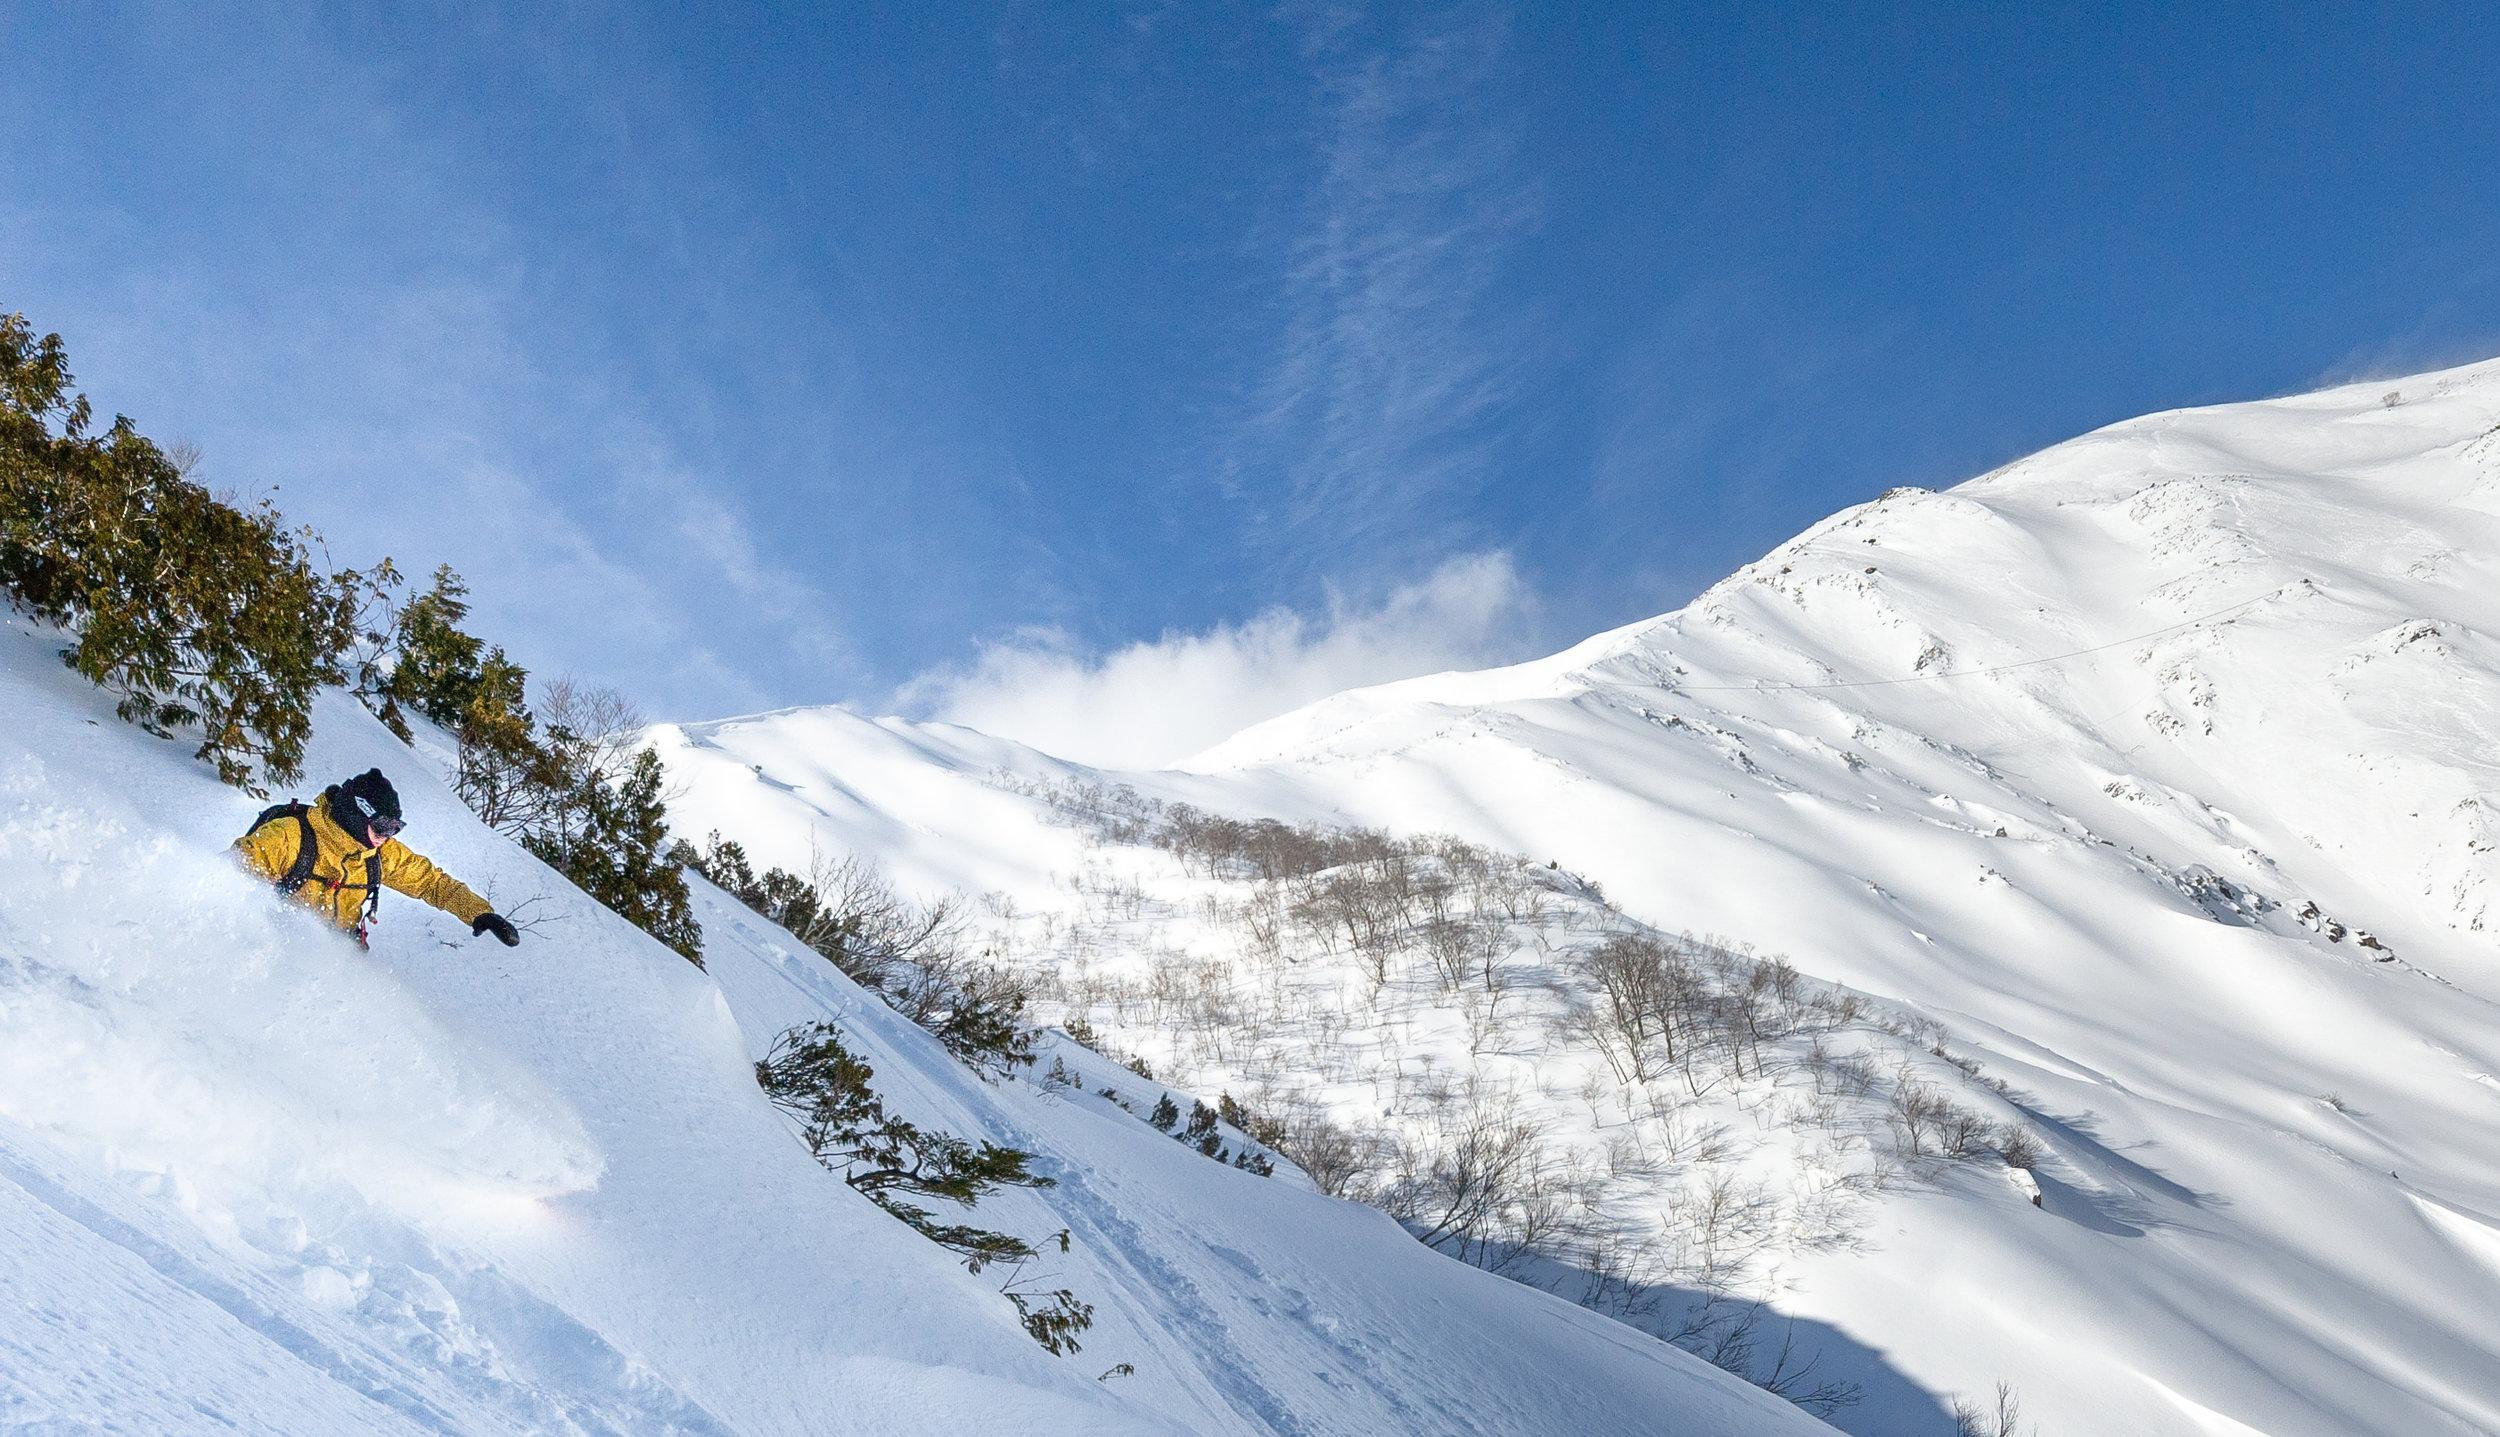 JGasaway_Skiing-31.jpg